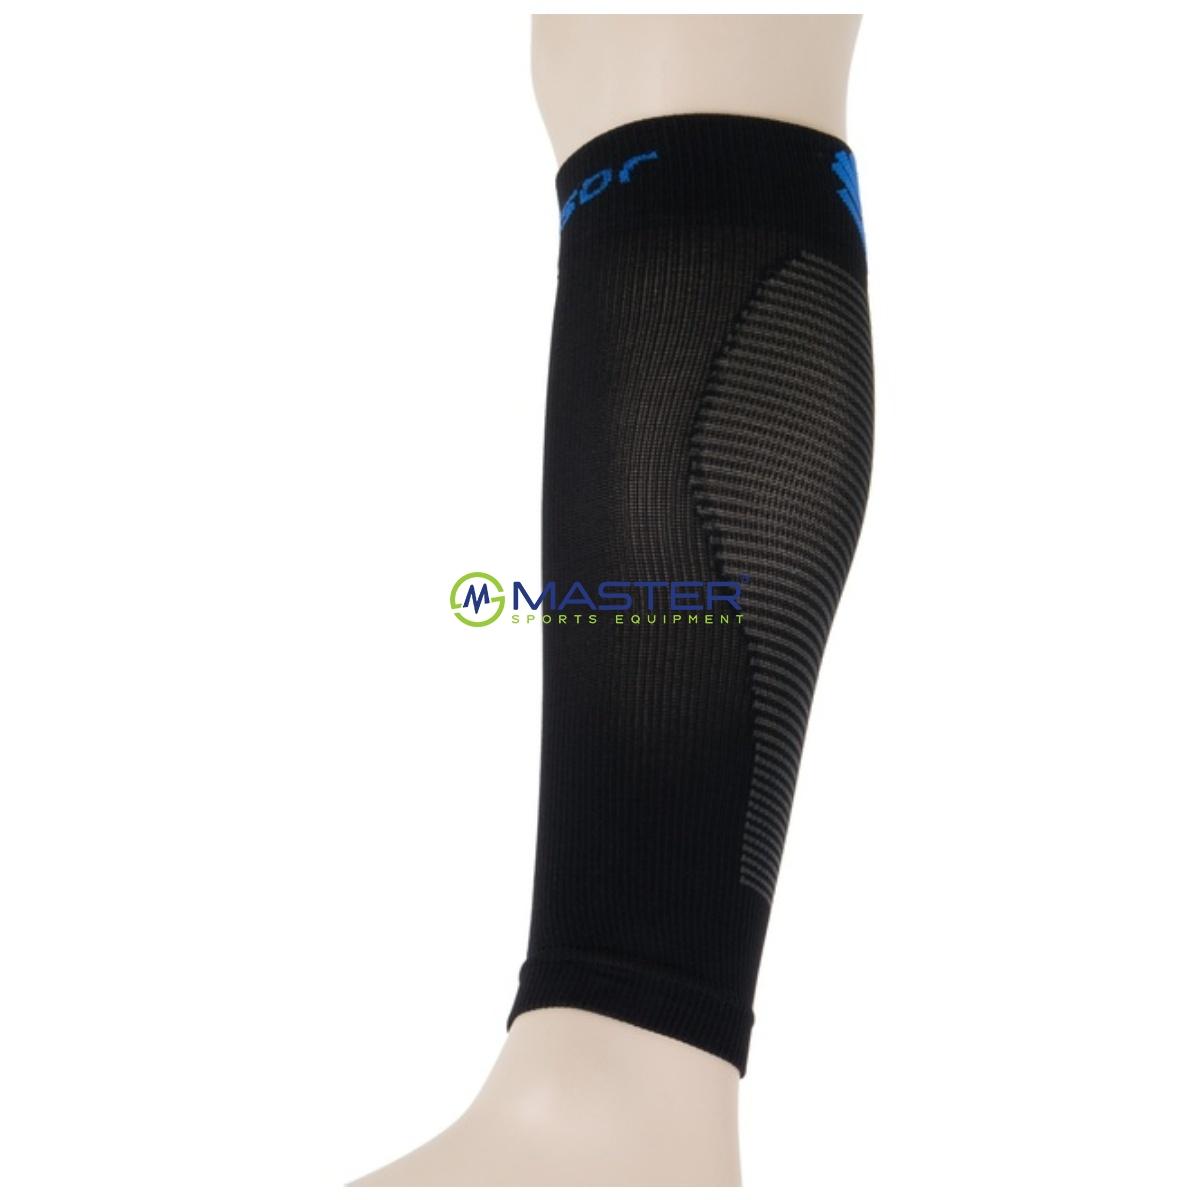 a7f79472f85c9 Návleky na nohy Sensor Compress | NAJLACNEJSISPORT.SK | Autorizovaný ...